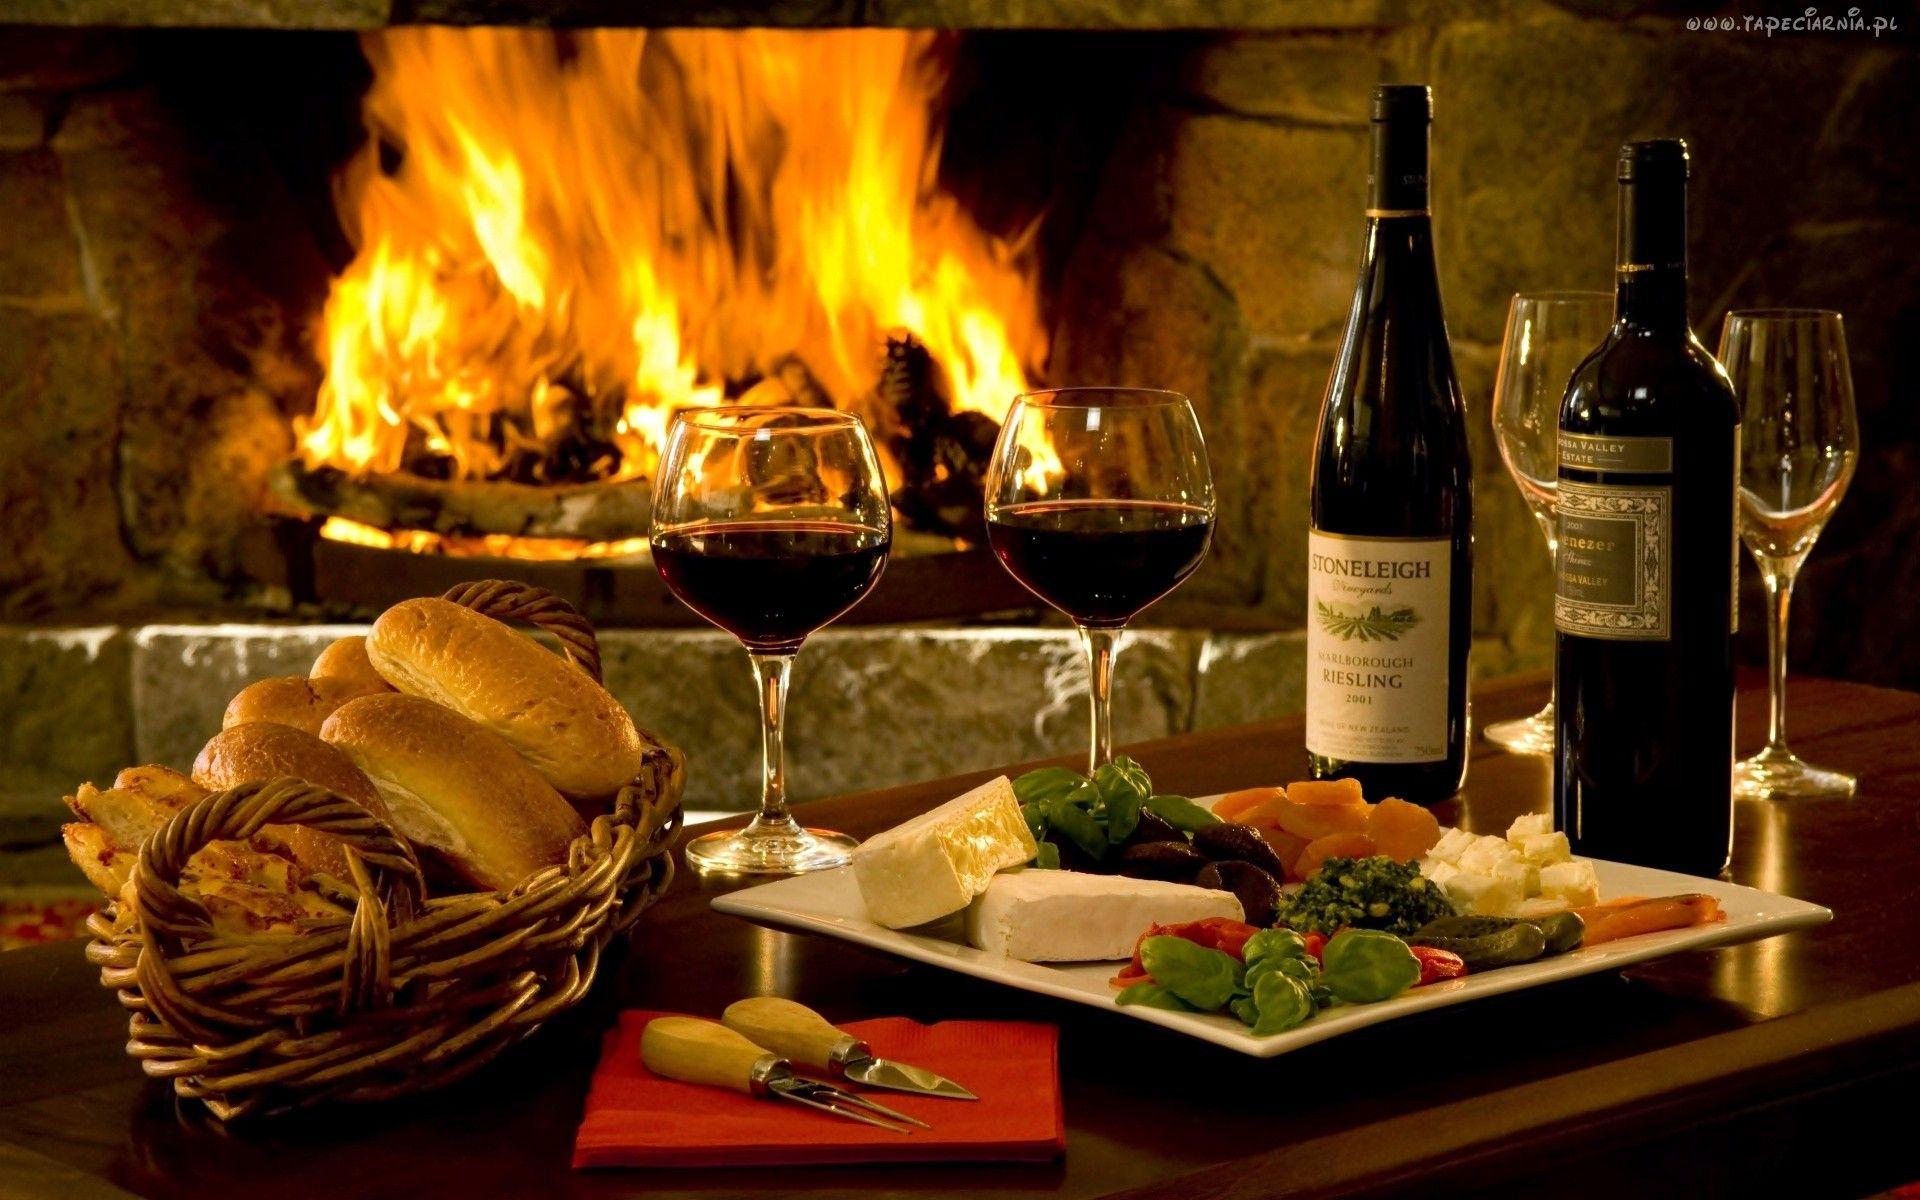 Wnetrze Kominek Ogien Wino Kieliszki Ser Bulki Wine Red Wine Romantic Dinners